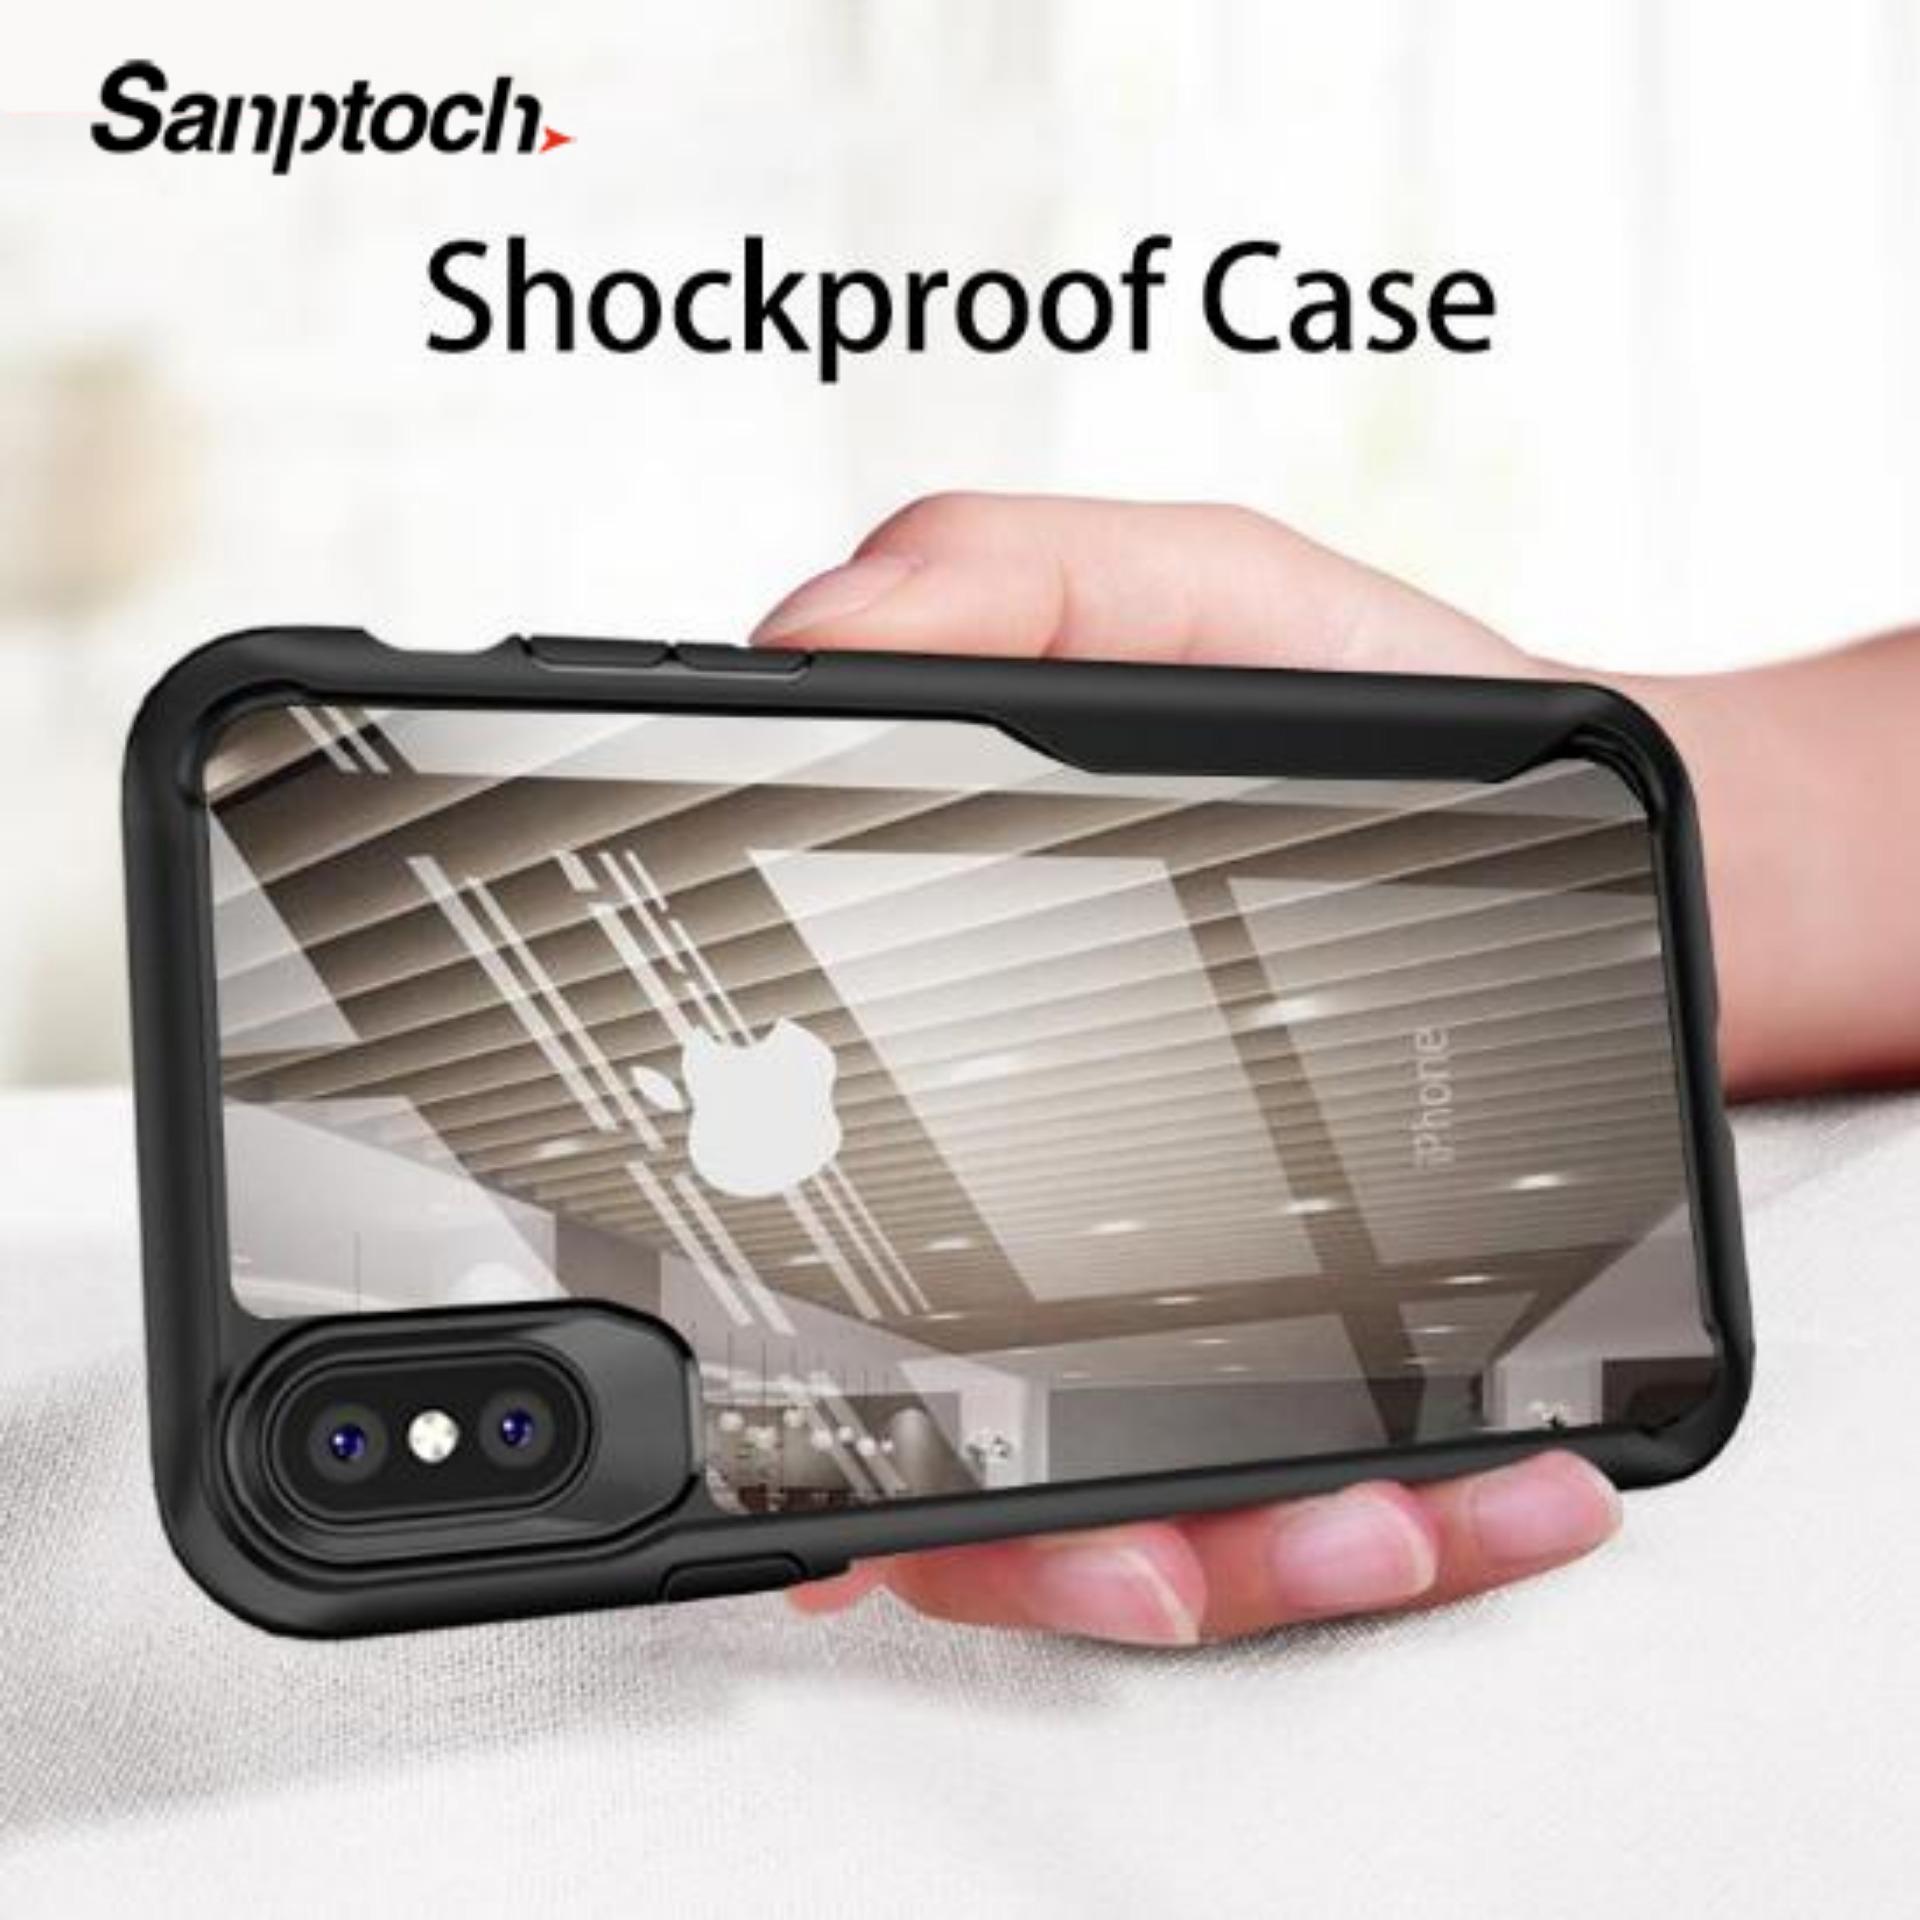 sale retailer 4ba15 a3ce4 Shockproof Armor Case For iPhone XS Max XR X 8 7 6 6s Plus Transparent Case  Cover For iPhone 5 5S SE Luxury Silicone Case Cover Casing